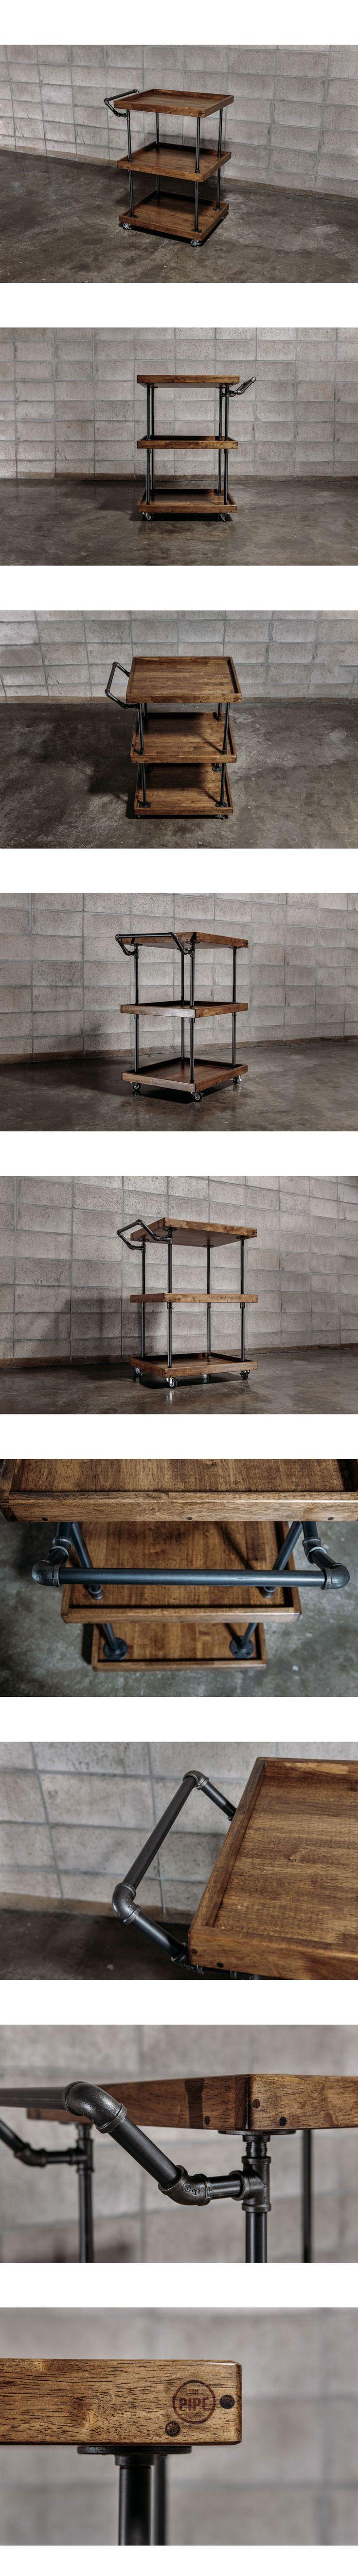 0053f33da6c60276b47c59c16a8b0fc3  pipe table pipe shelves Top Result 50 Best Of Kroger Patio Furniture Gallery 2017 Pkt6